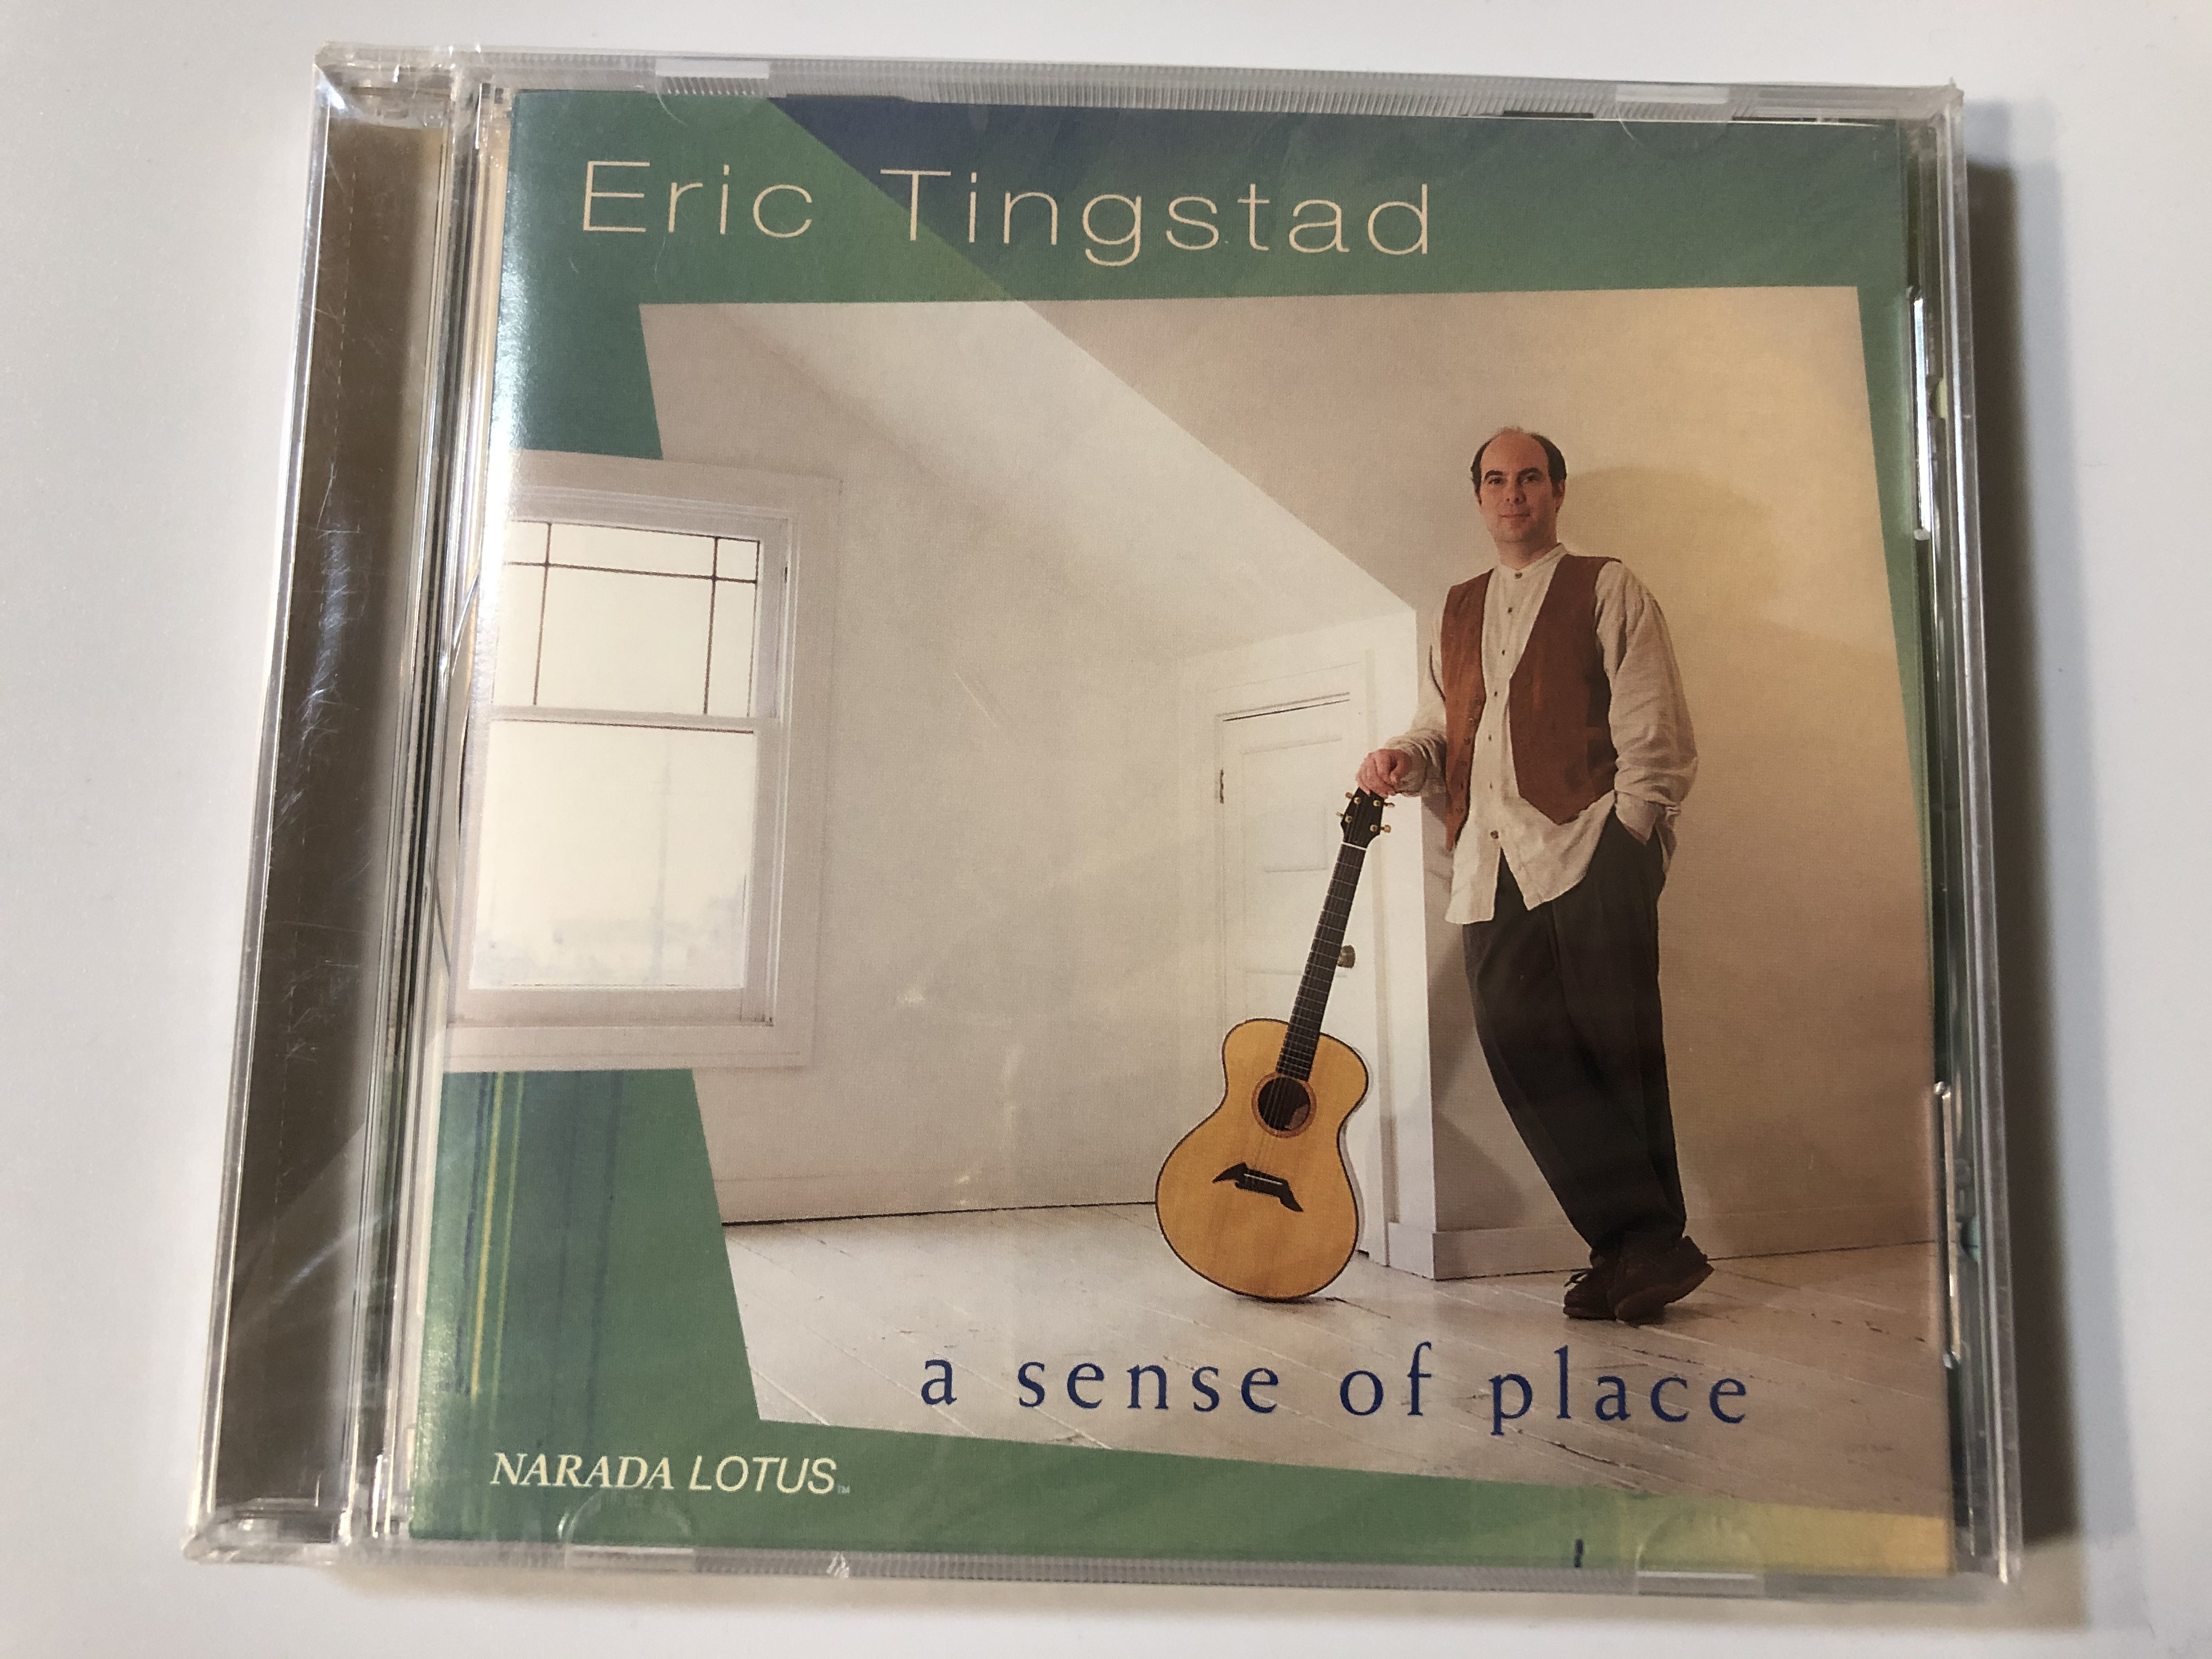 eric-tingstad-a-sense-of-place-narada-lotus-audio-cd-1995-nd-61048-1-.jpg